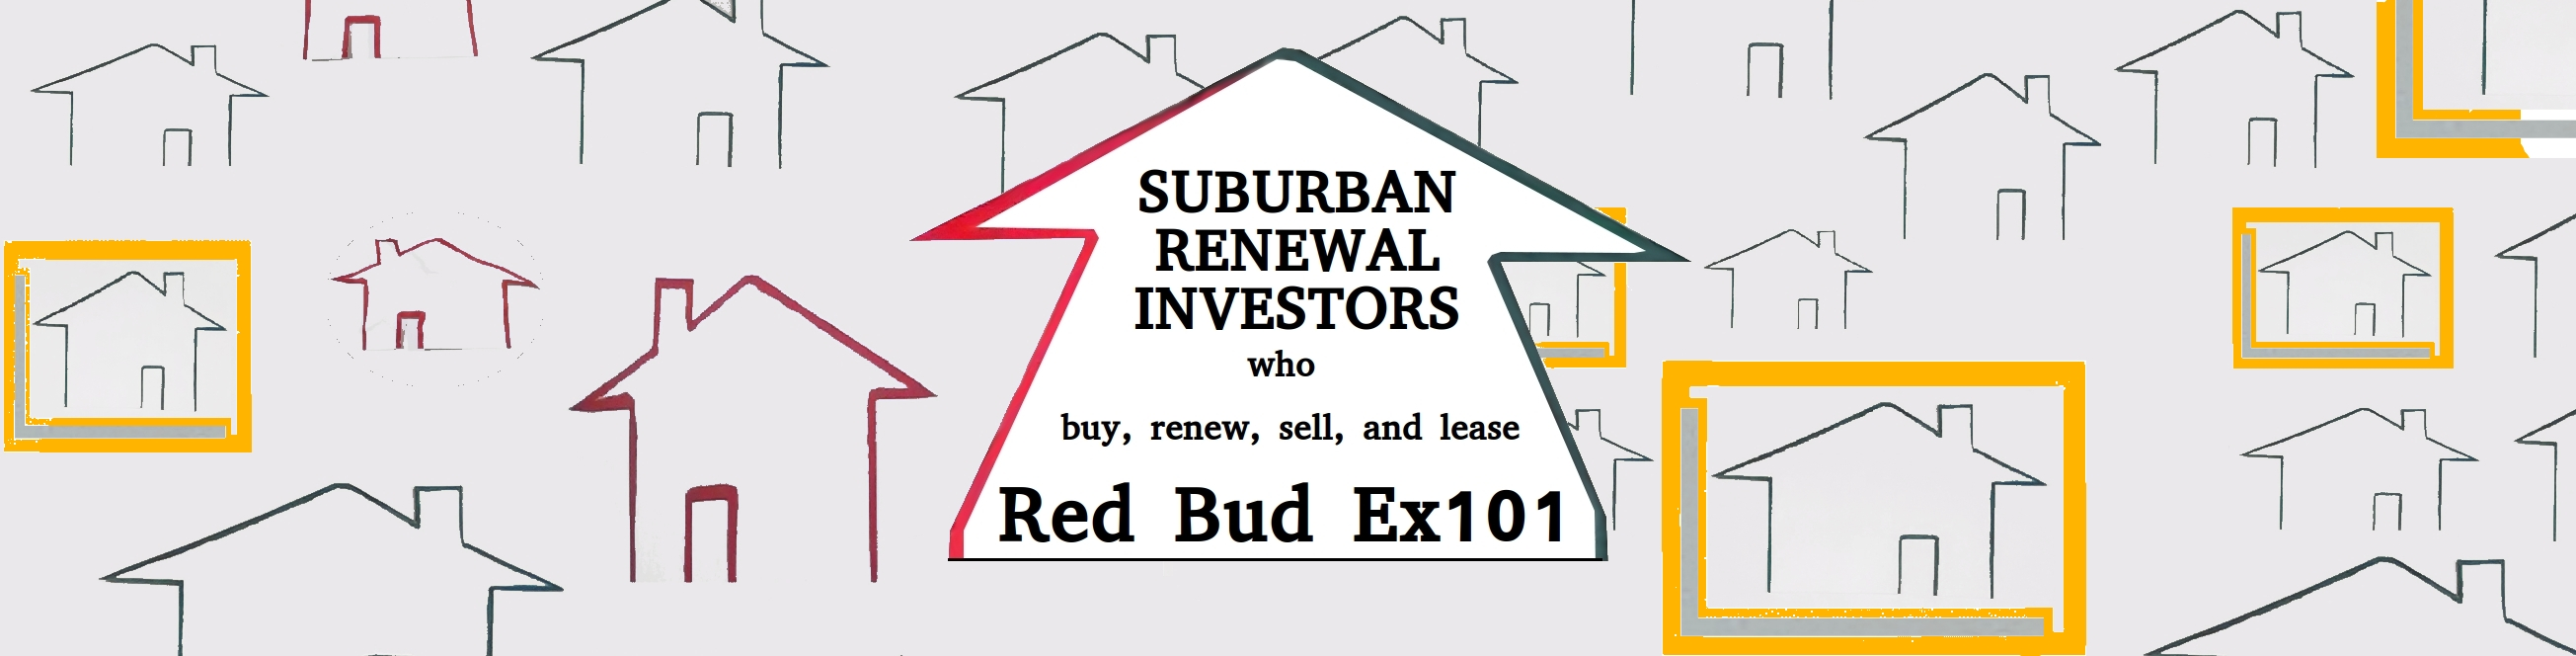 and Red Bud Inn, Inc. in Buchanan, MI